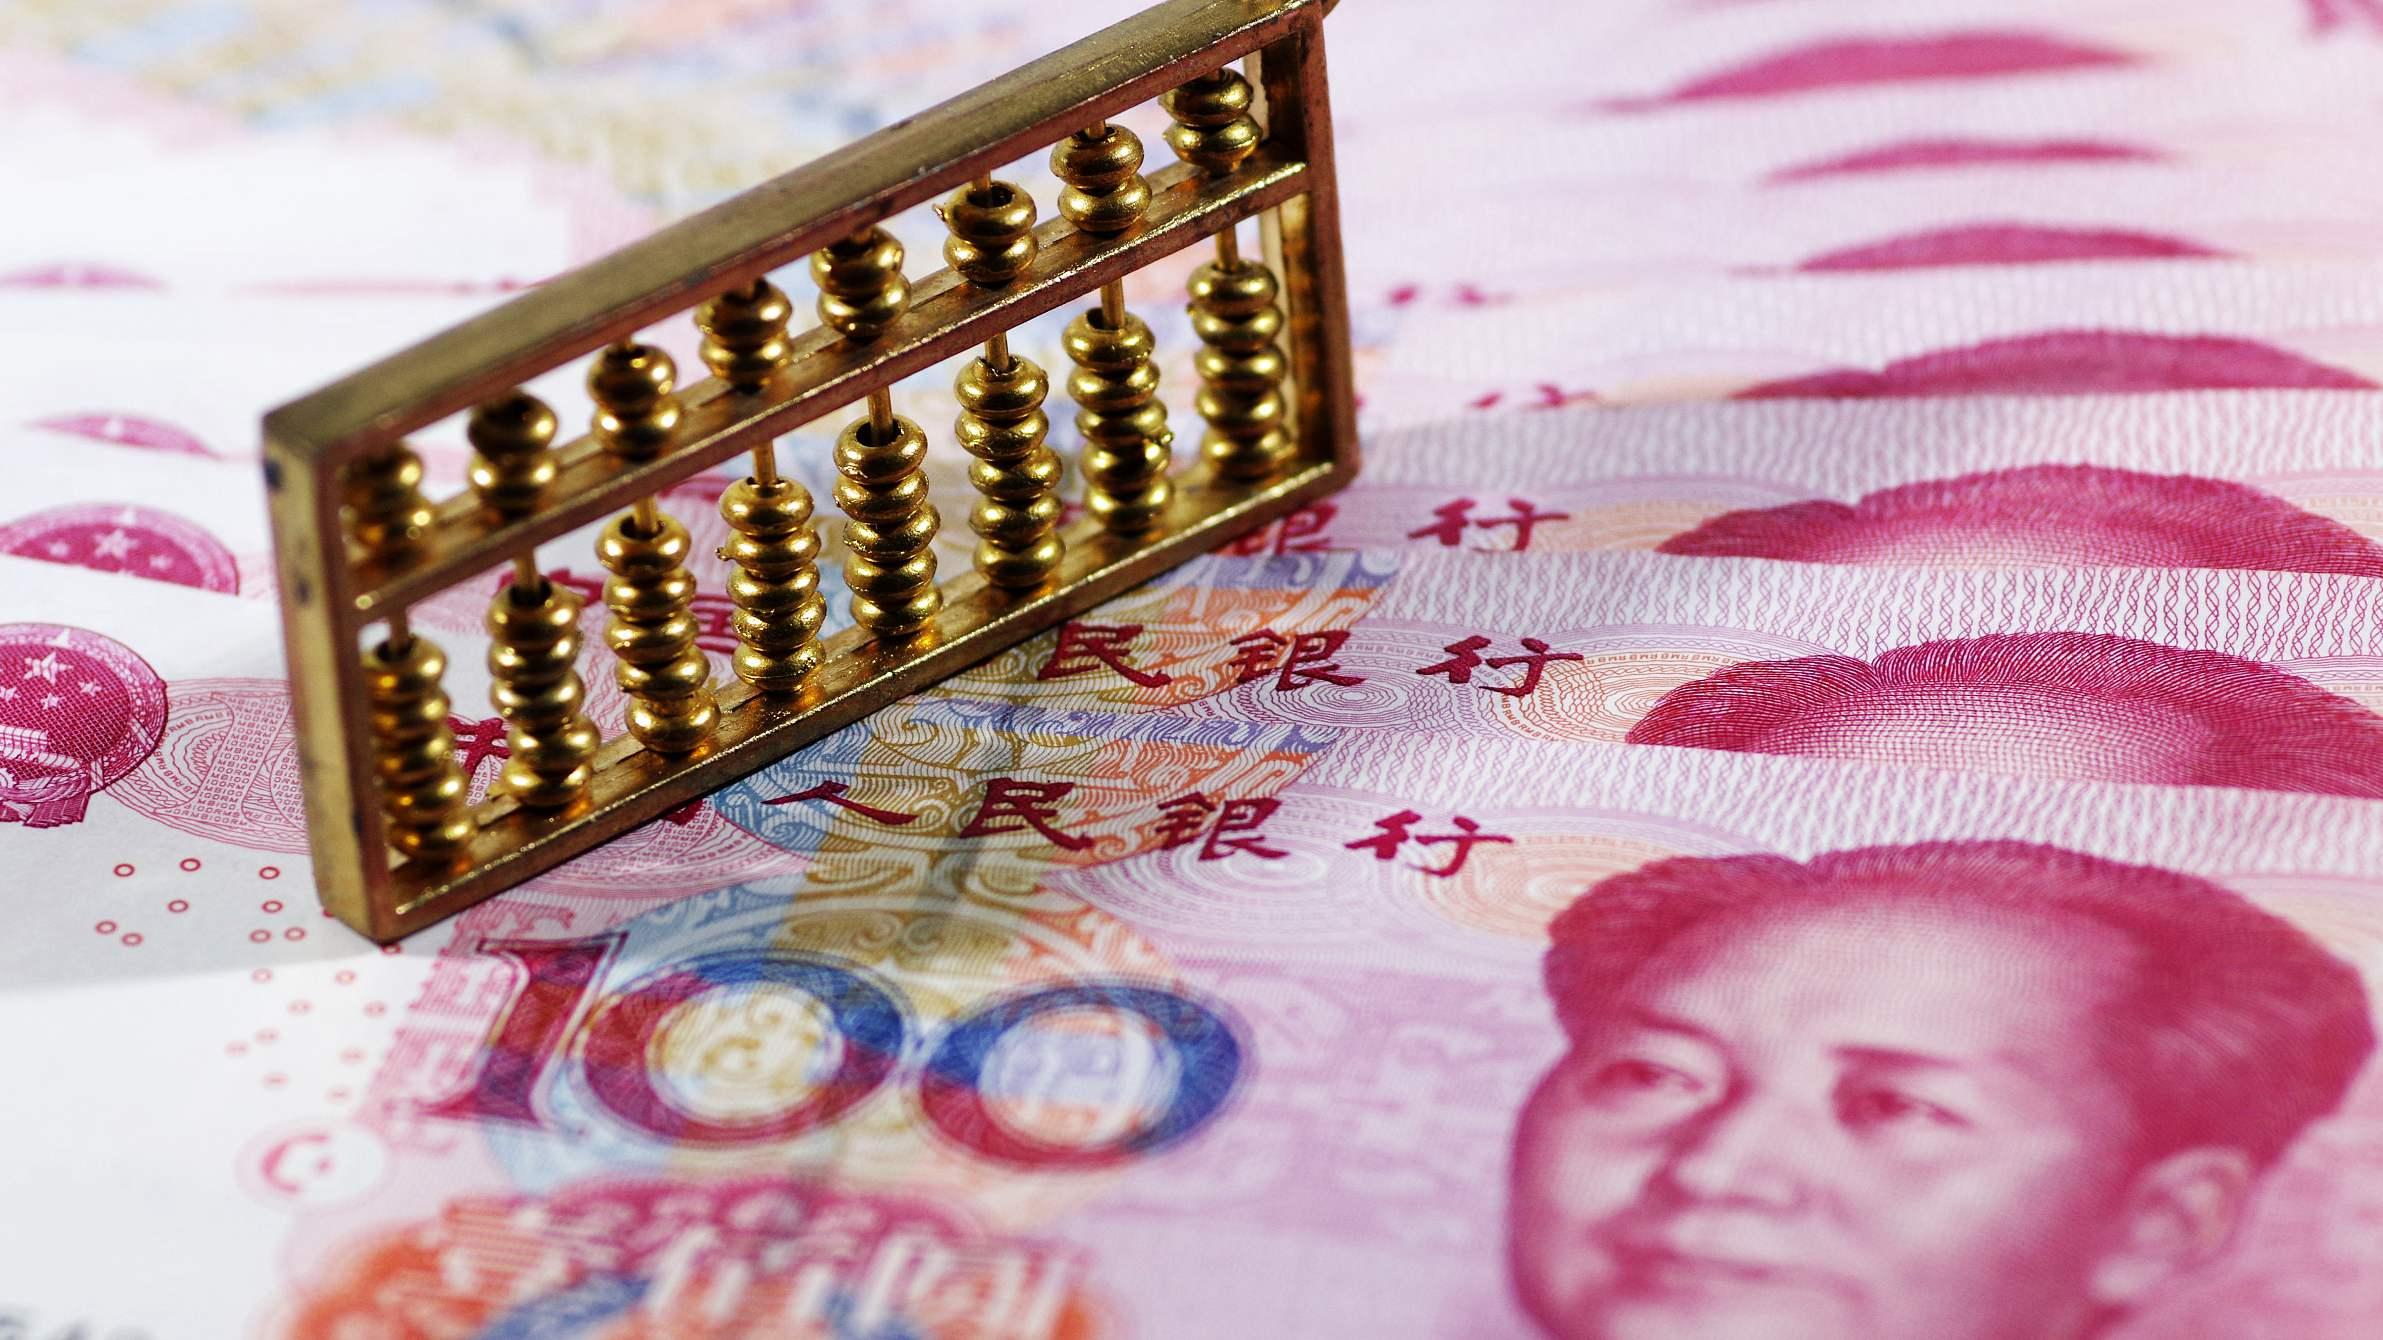 China to advance RMB internationalization steadily and prudently